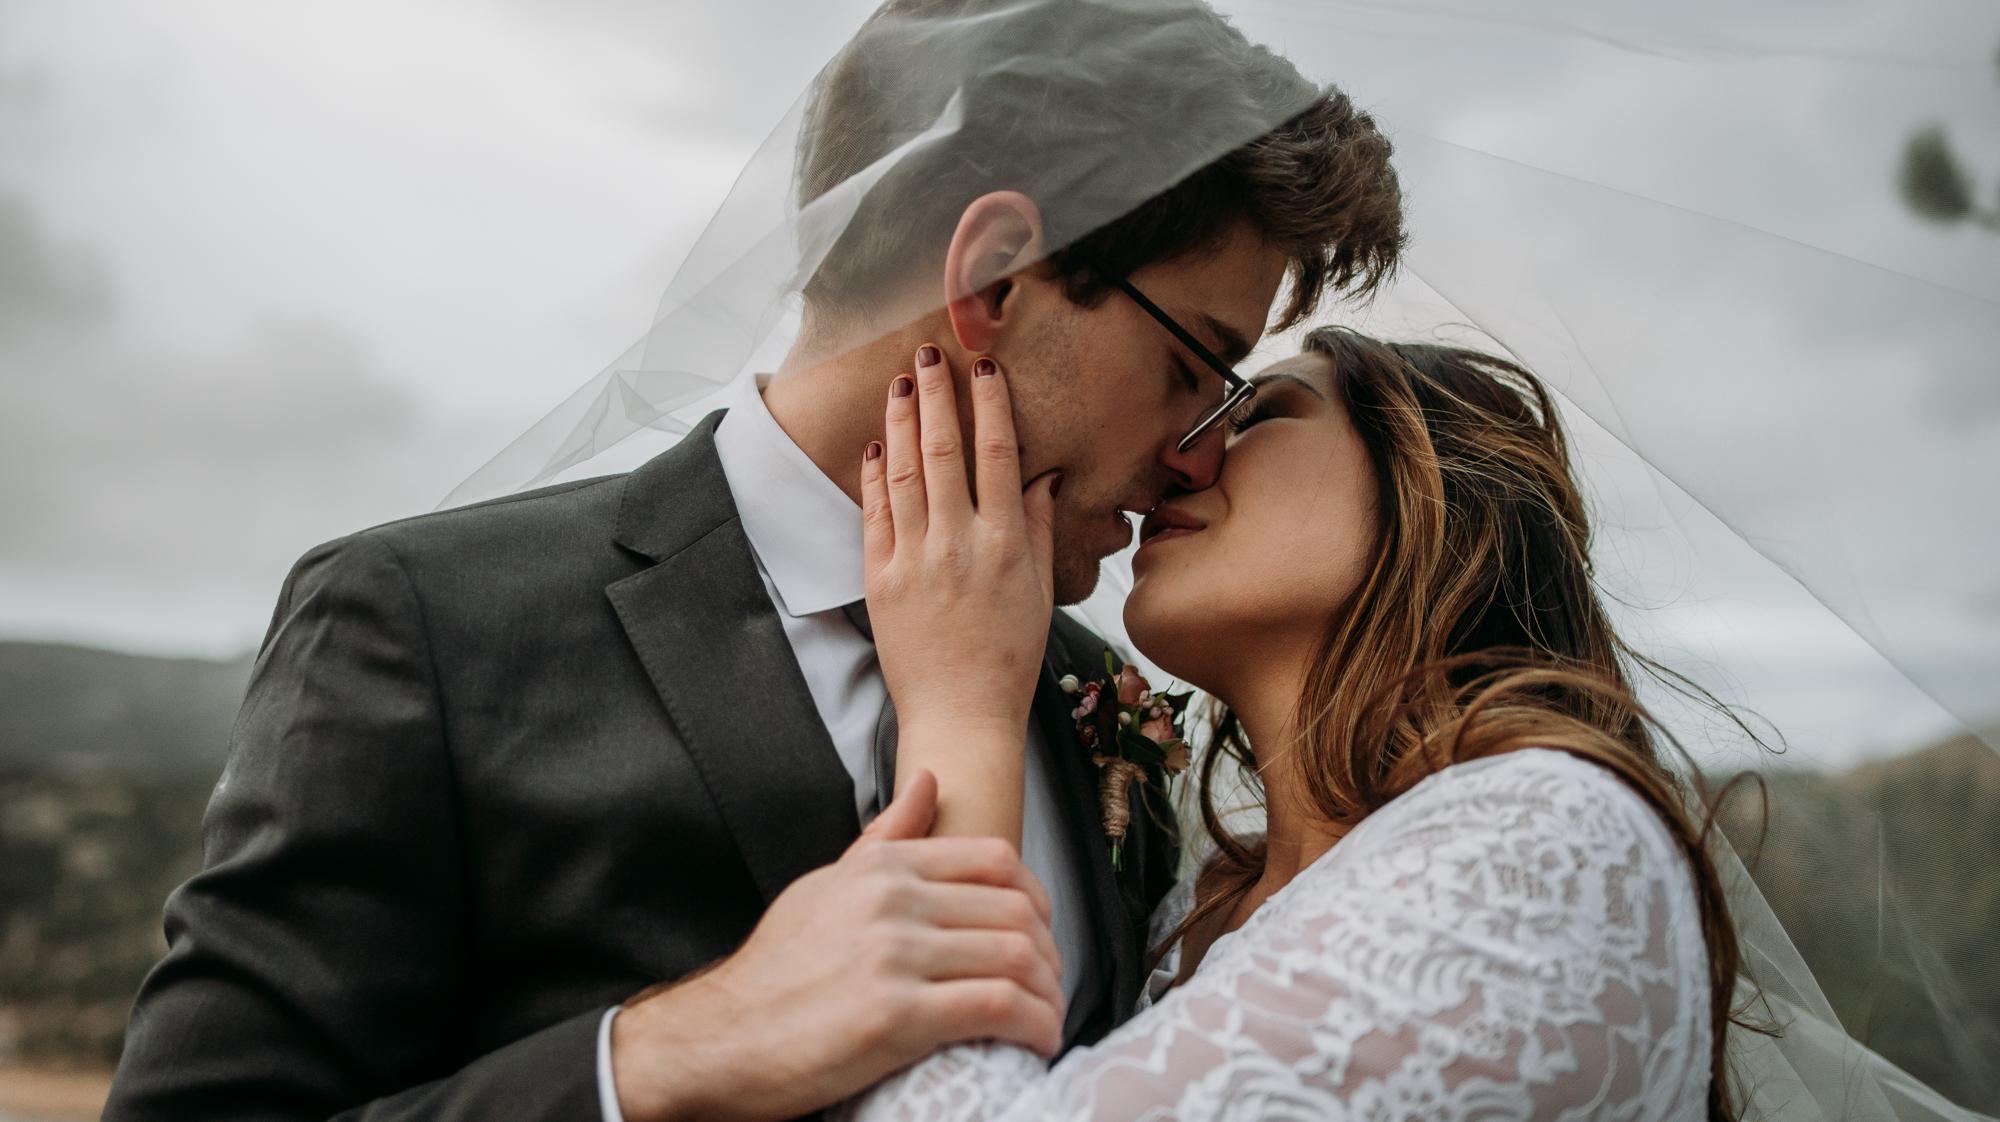 wild_earth_weddings_colorado_elopement_photographer_dogs_rocky_mountains-32.jpg